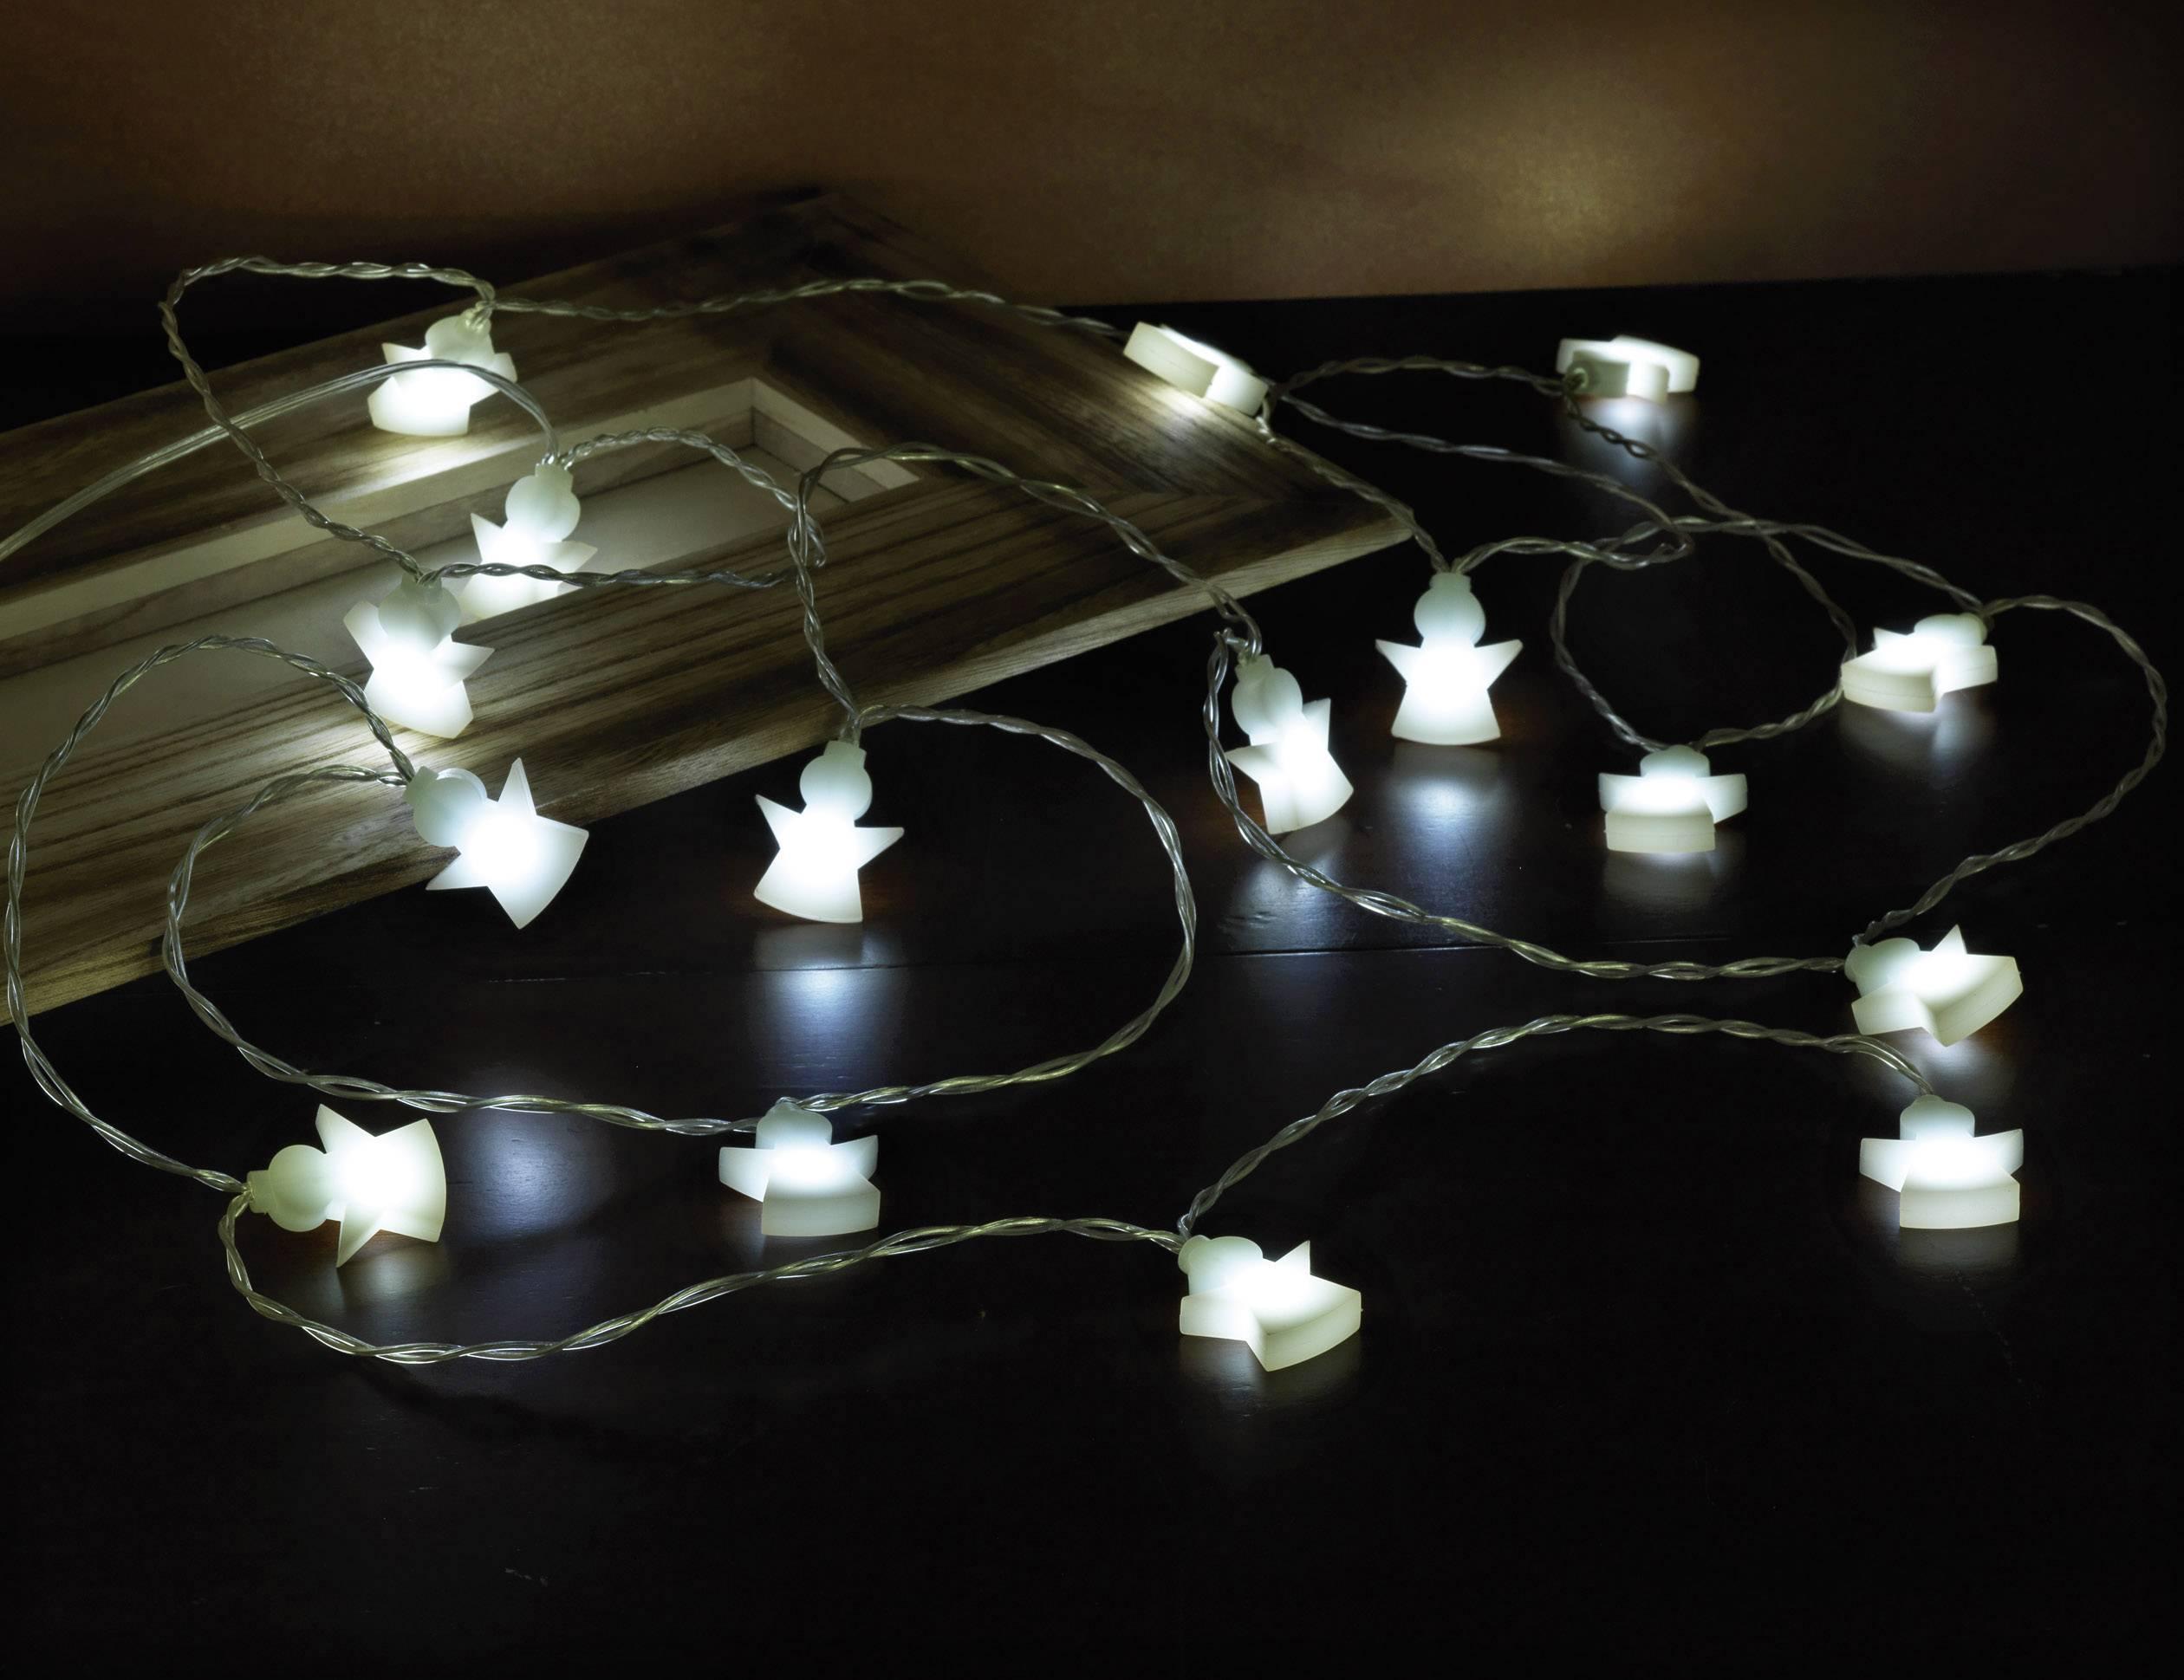 Vnútorná svetelná reťaz Polarlite LBA-04-002, 16 LED, 3.5 m, na batérie, anjelik